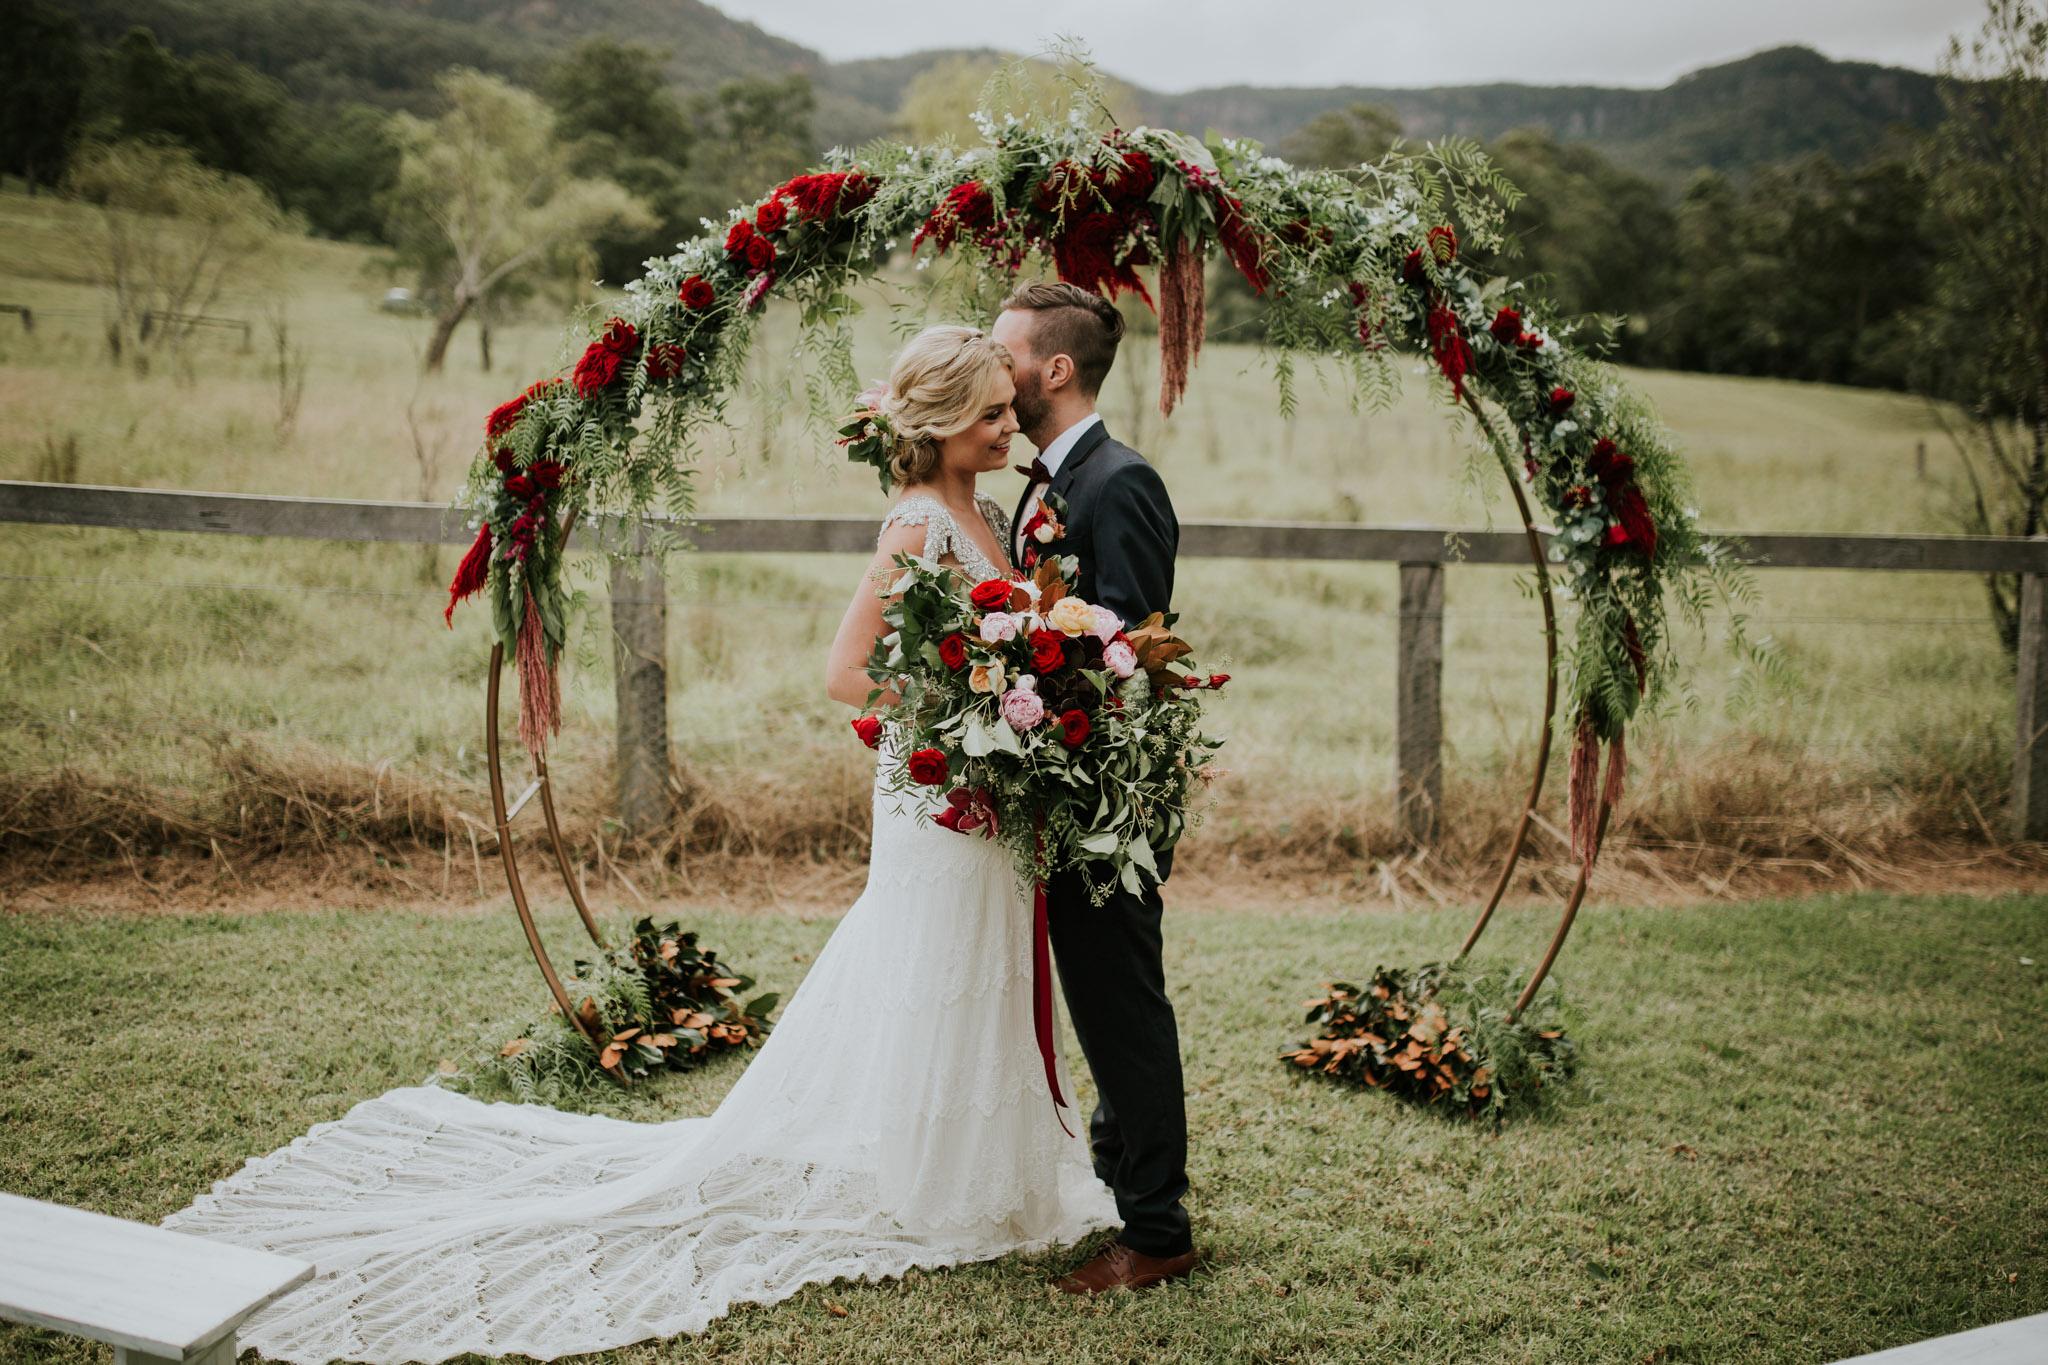 SPRING-GROVE-DAIRY-WEDDING-65.jpg